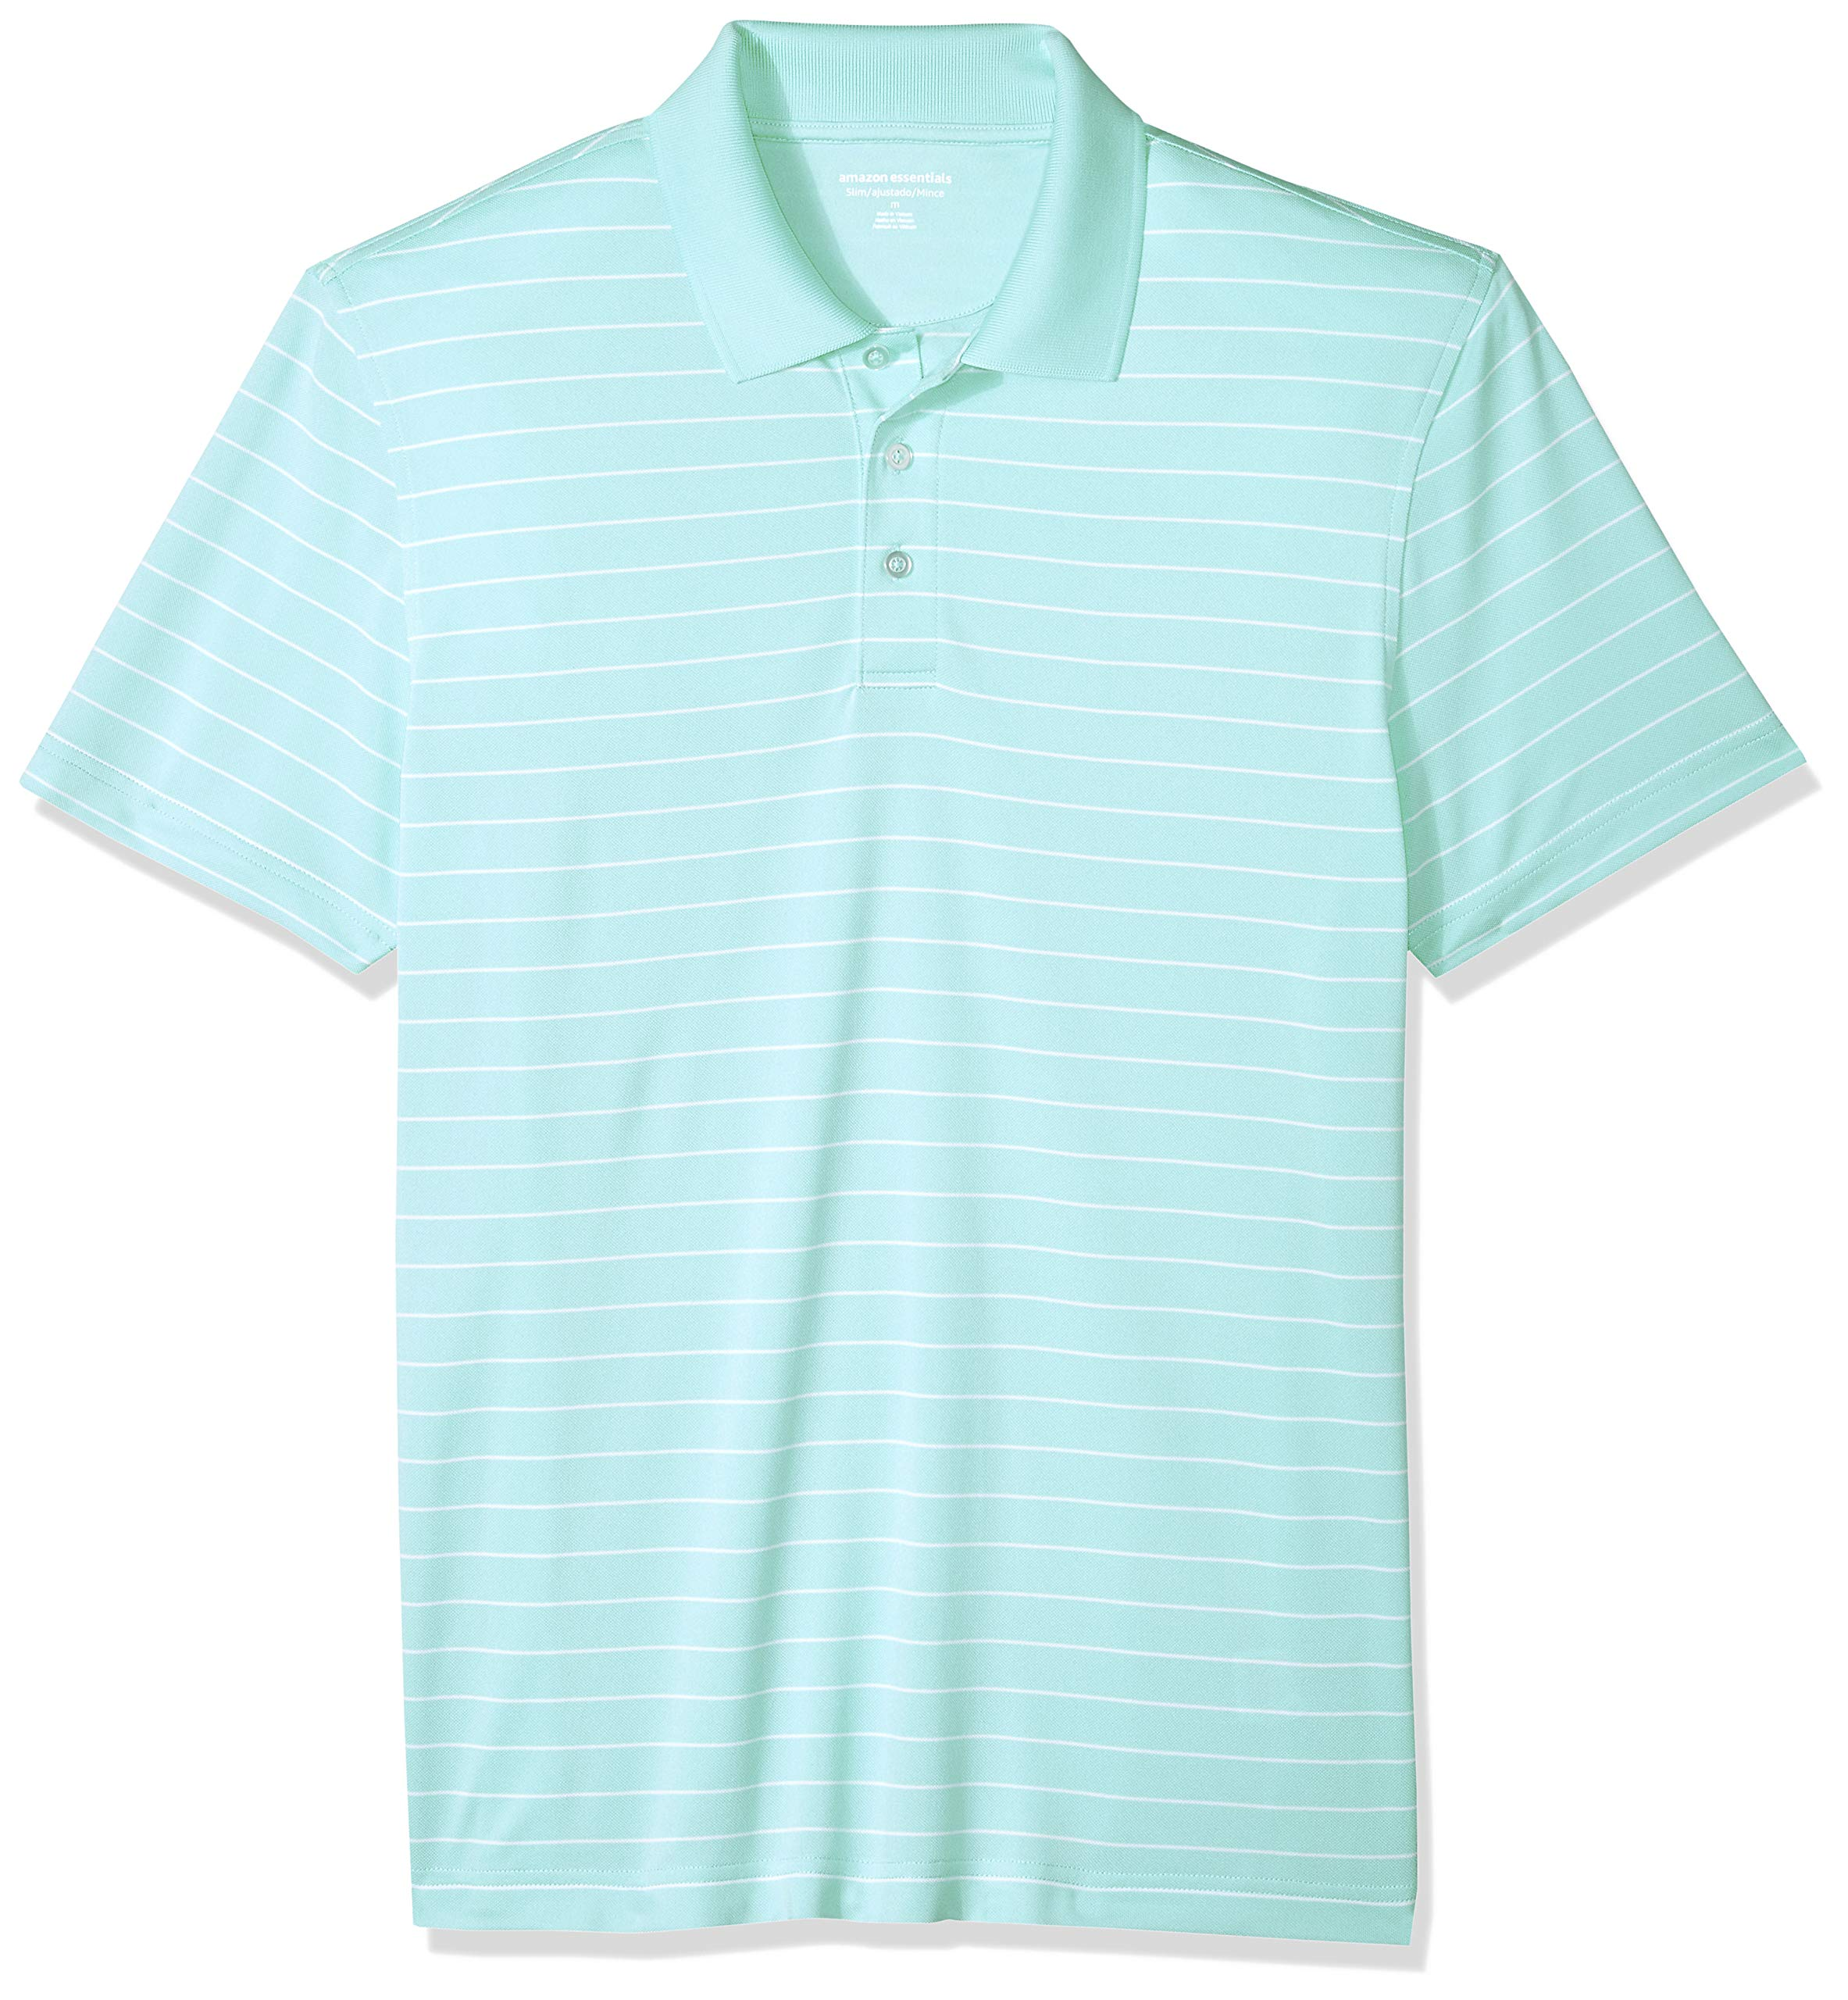 Amazon Essentials Men's Slim-Fit Quick-Dry Golf Polo Shirt, Aqua Stripe, X-Small